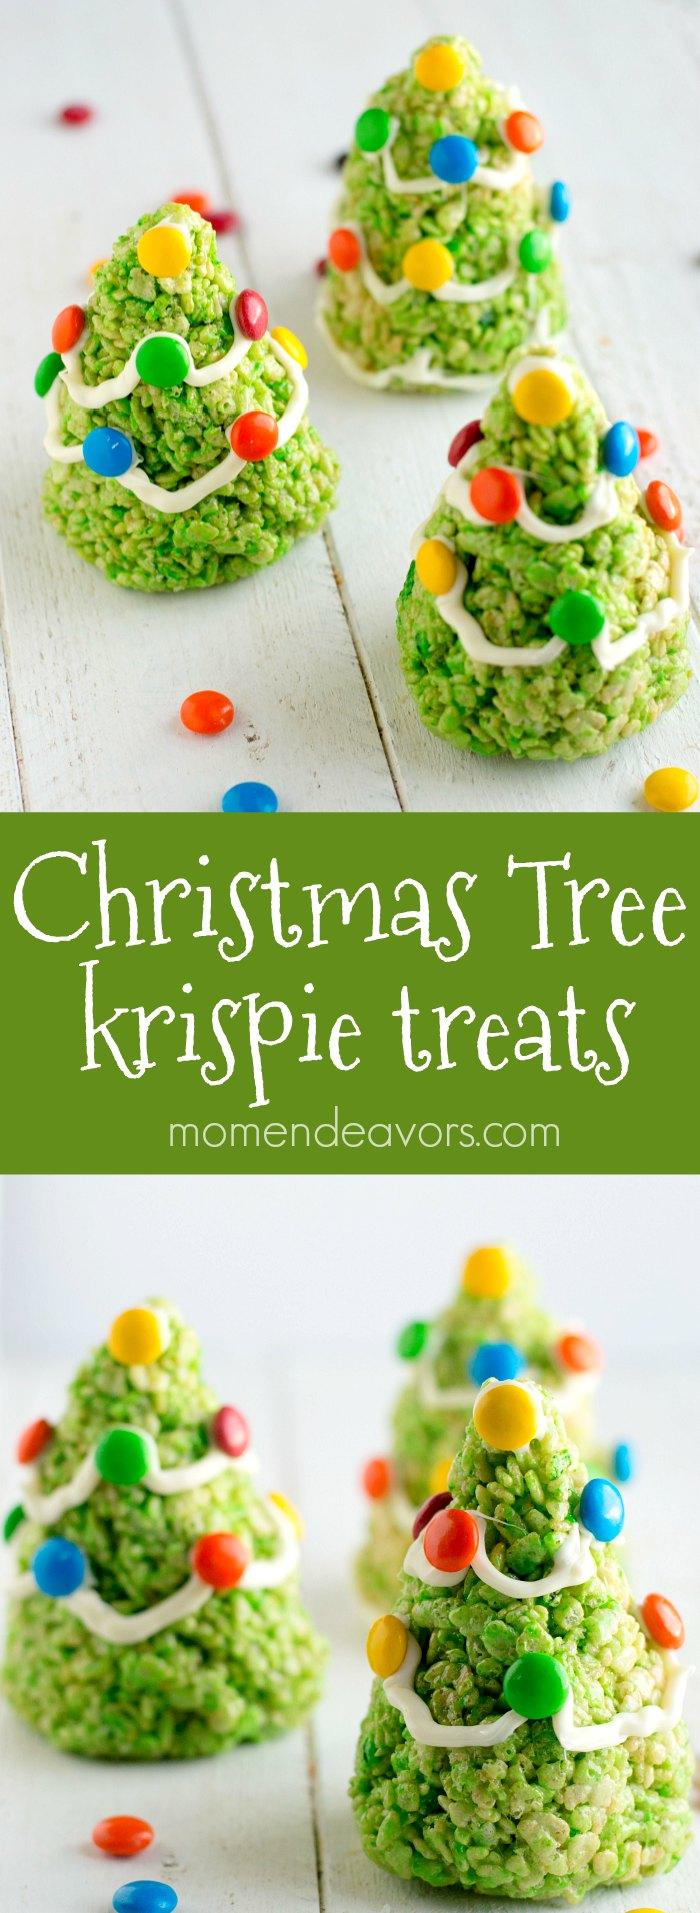 easy-christmas-tree-krispie-treats